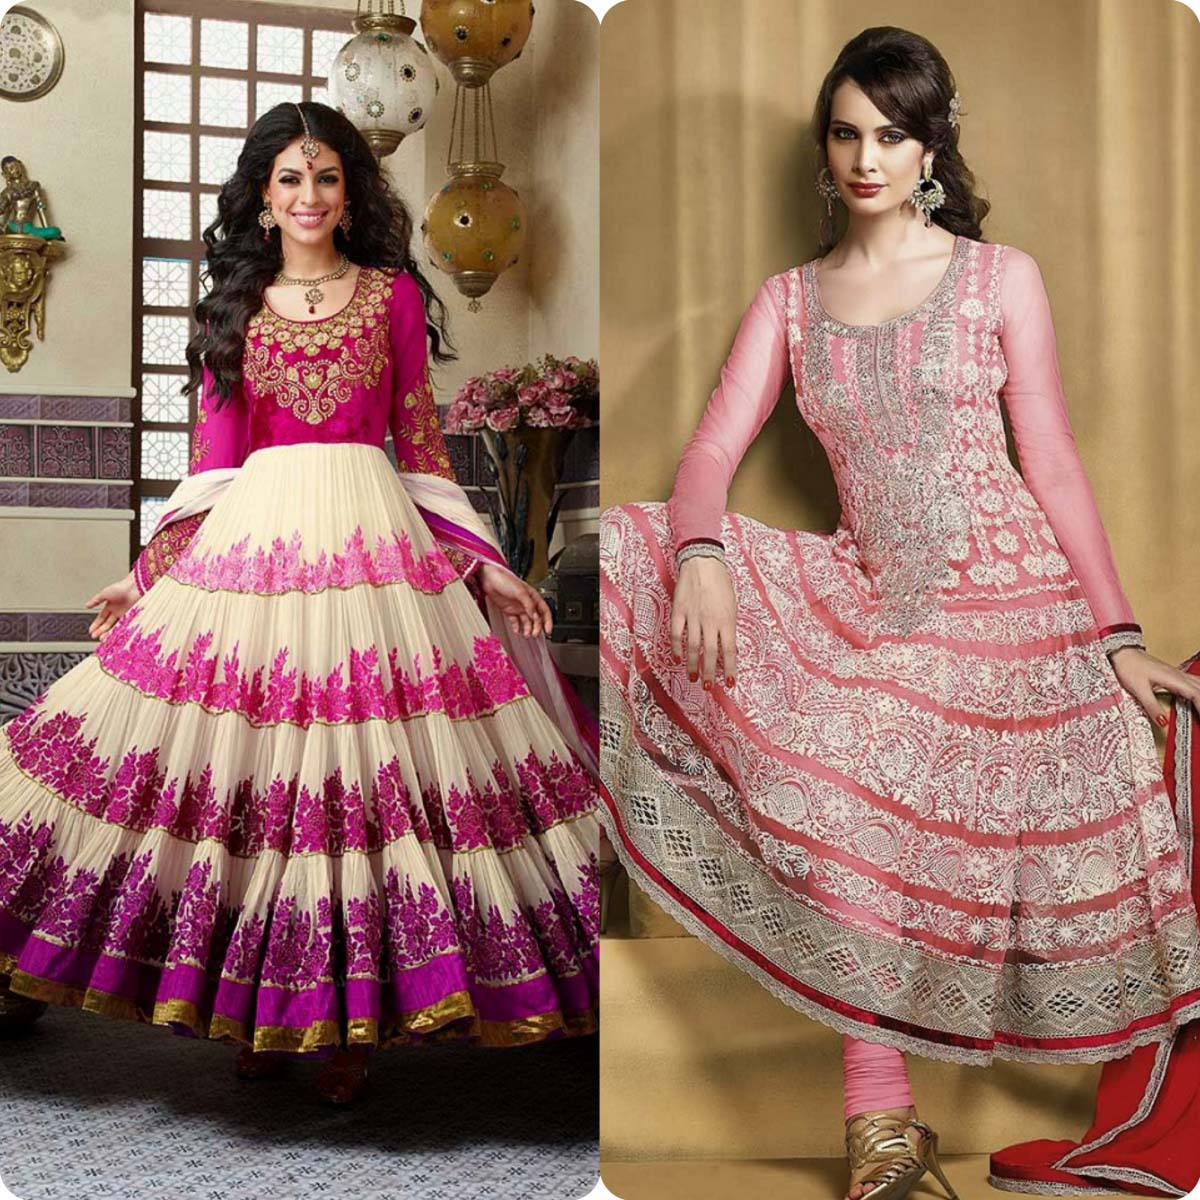 Indian Stylish Umbrella Frock and Churidar Dresses for Girls 2016-2017 (10)